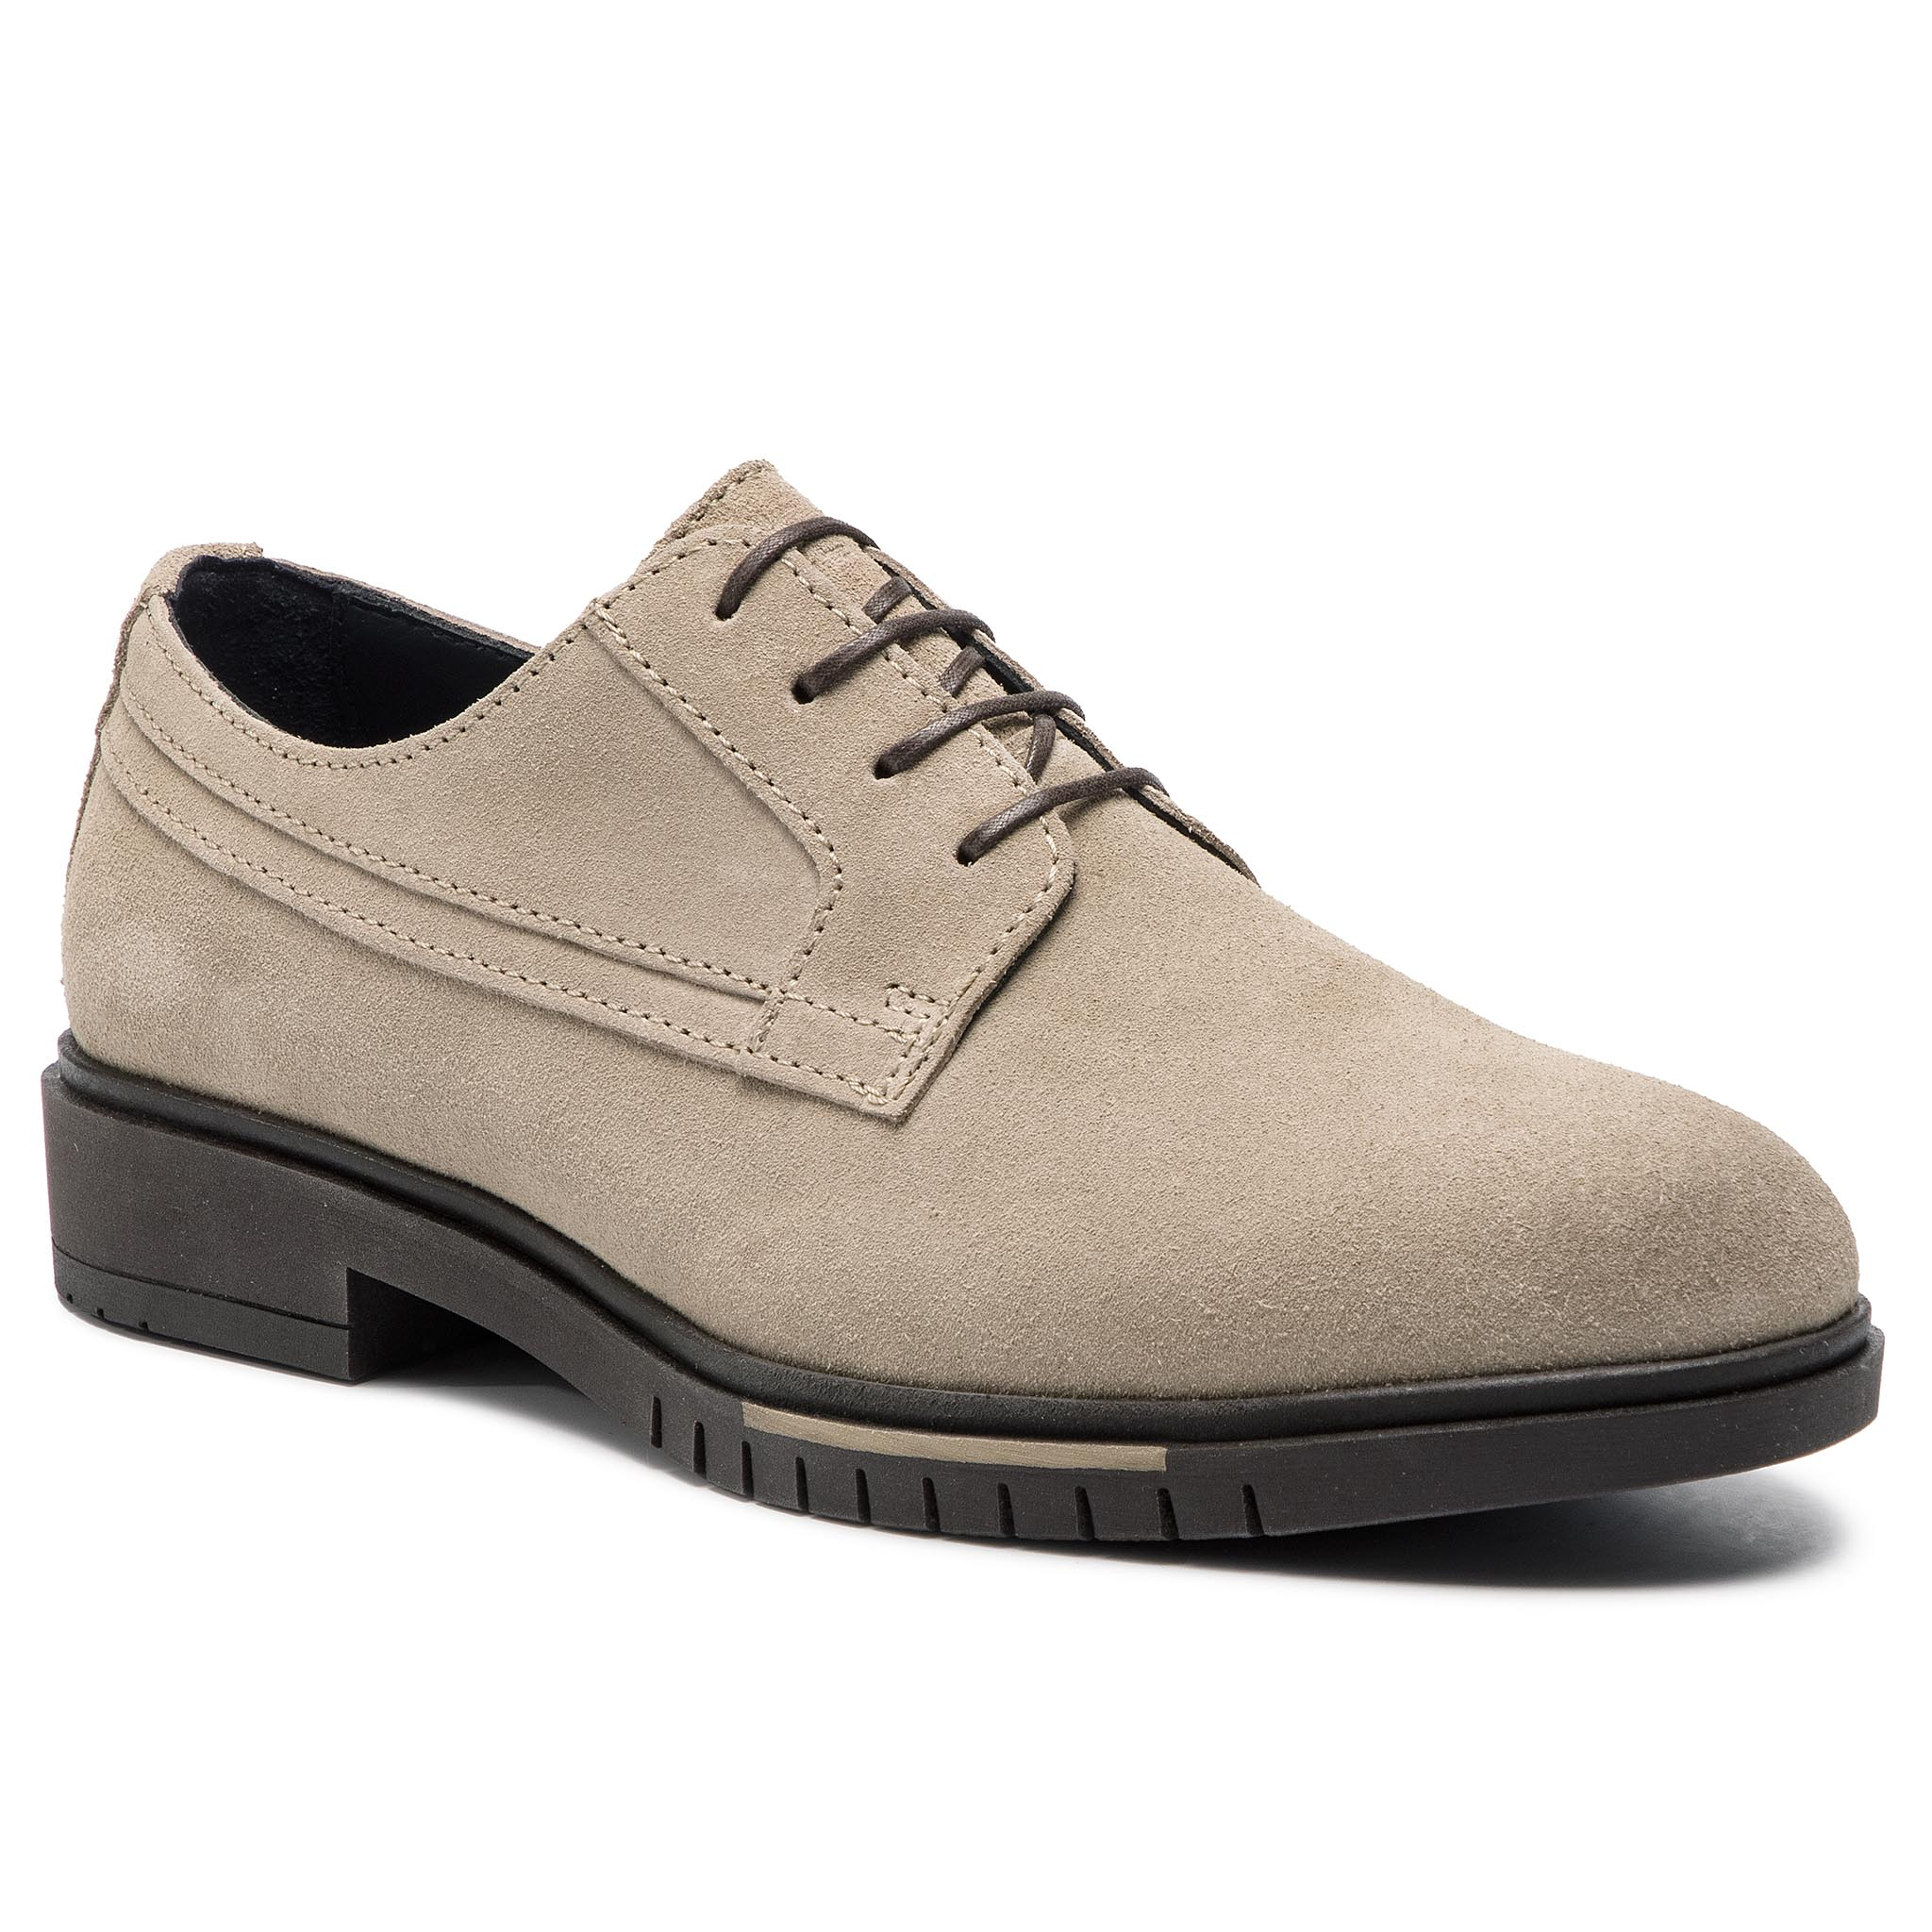 c4d8d79a90 Shoes NIKE - Zoom Stefan Janoski 333824 218 Lt British Tan/Lt ...